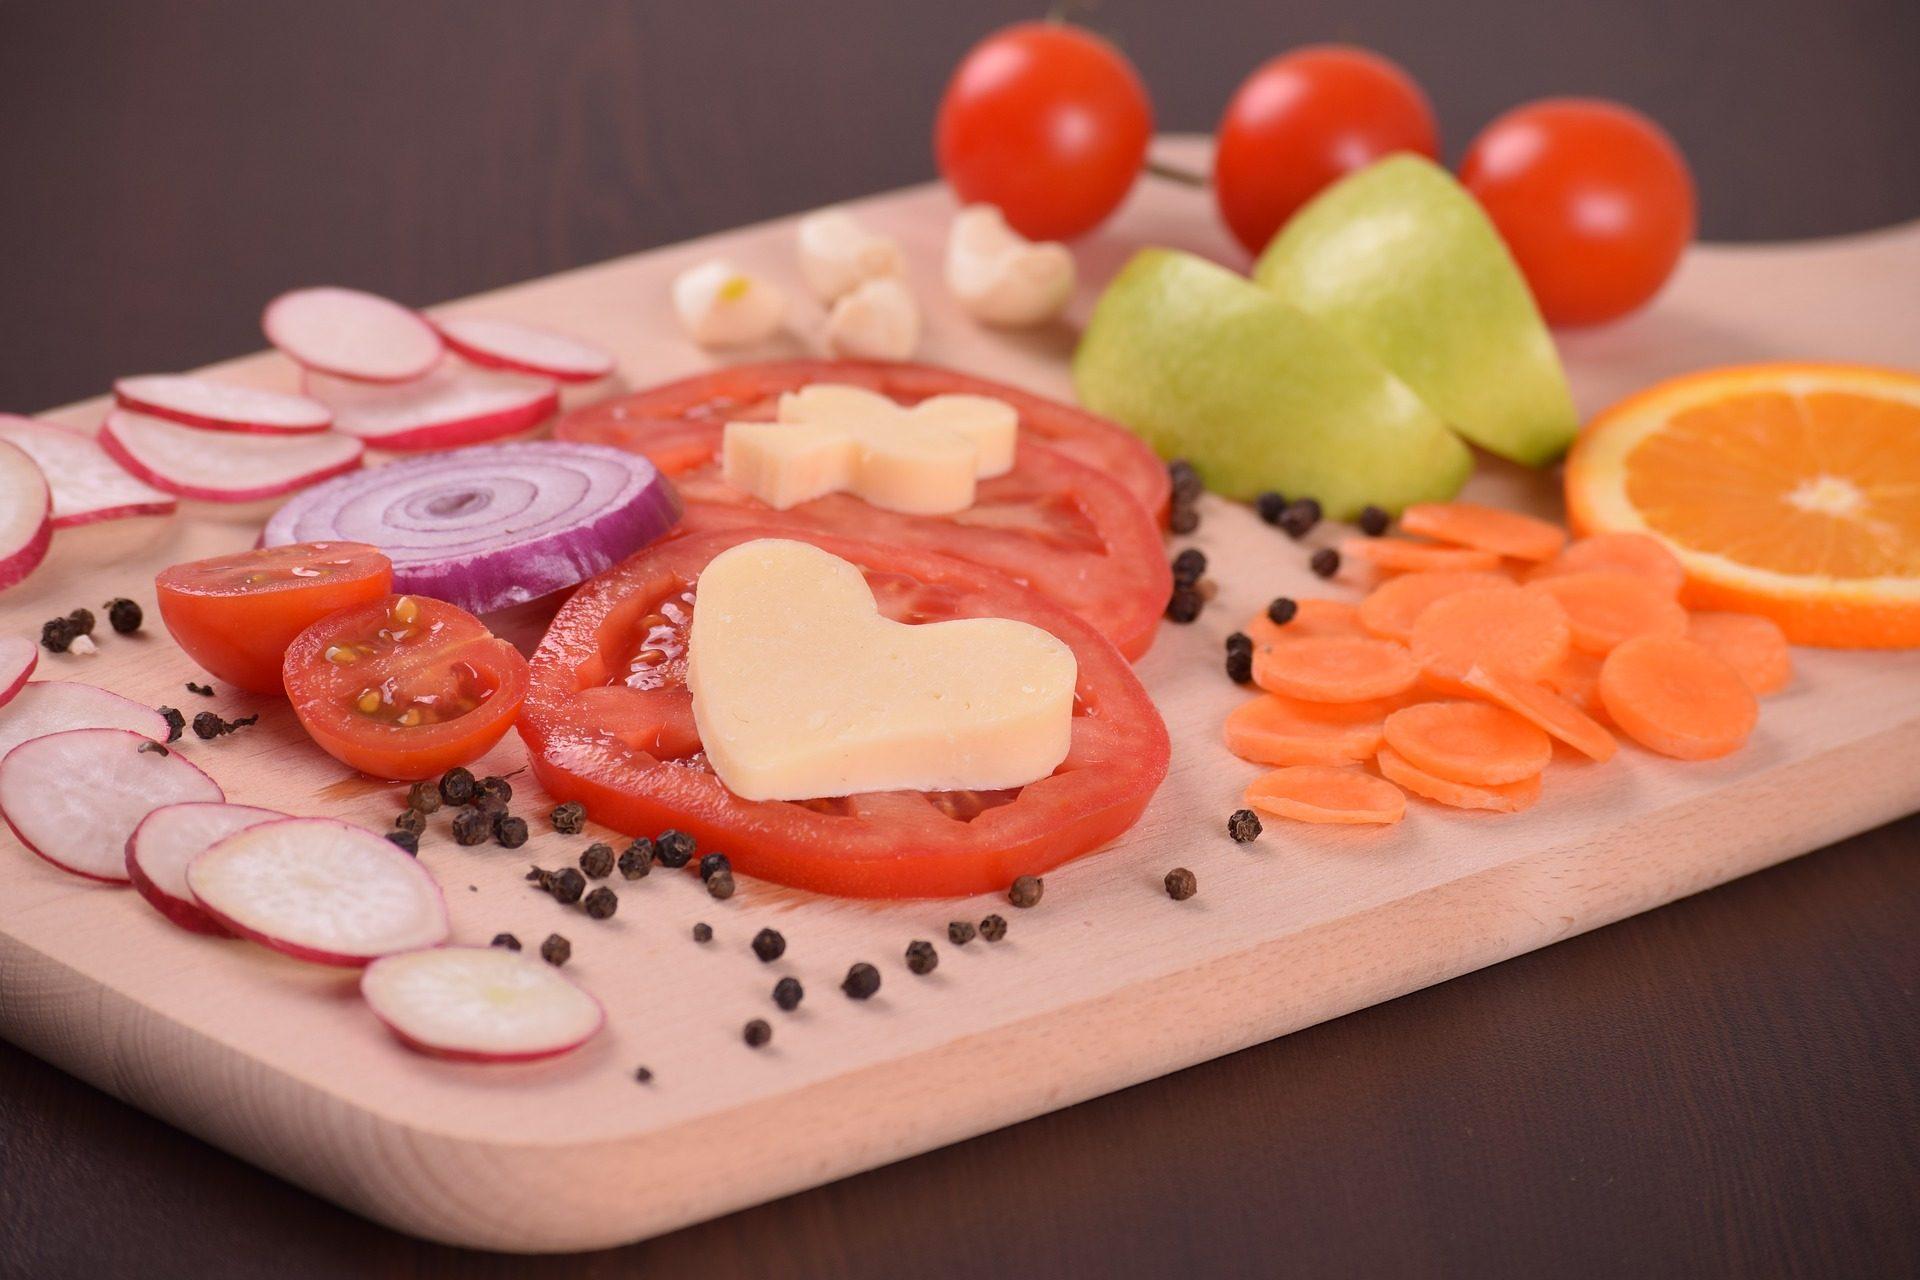 ensalada, verdura, fruta, tomate, cebolla, zanahoria, naranja - Fondos de Pantalla HD - professor-falken.com